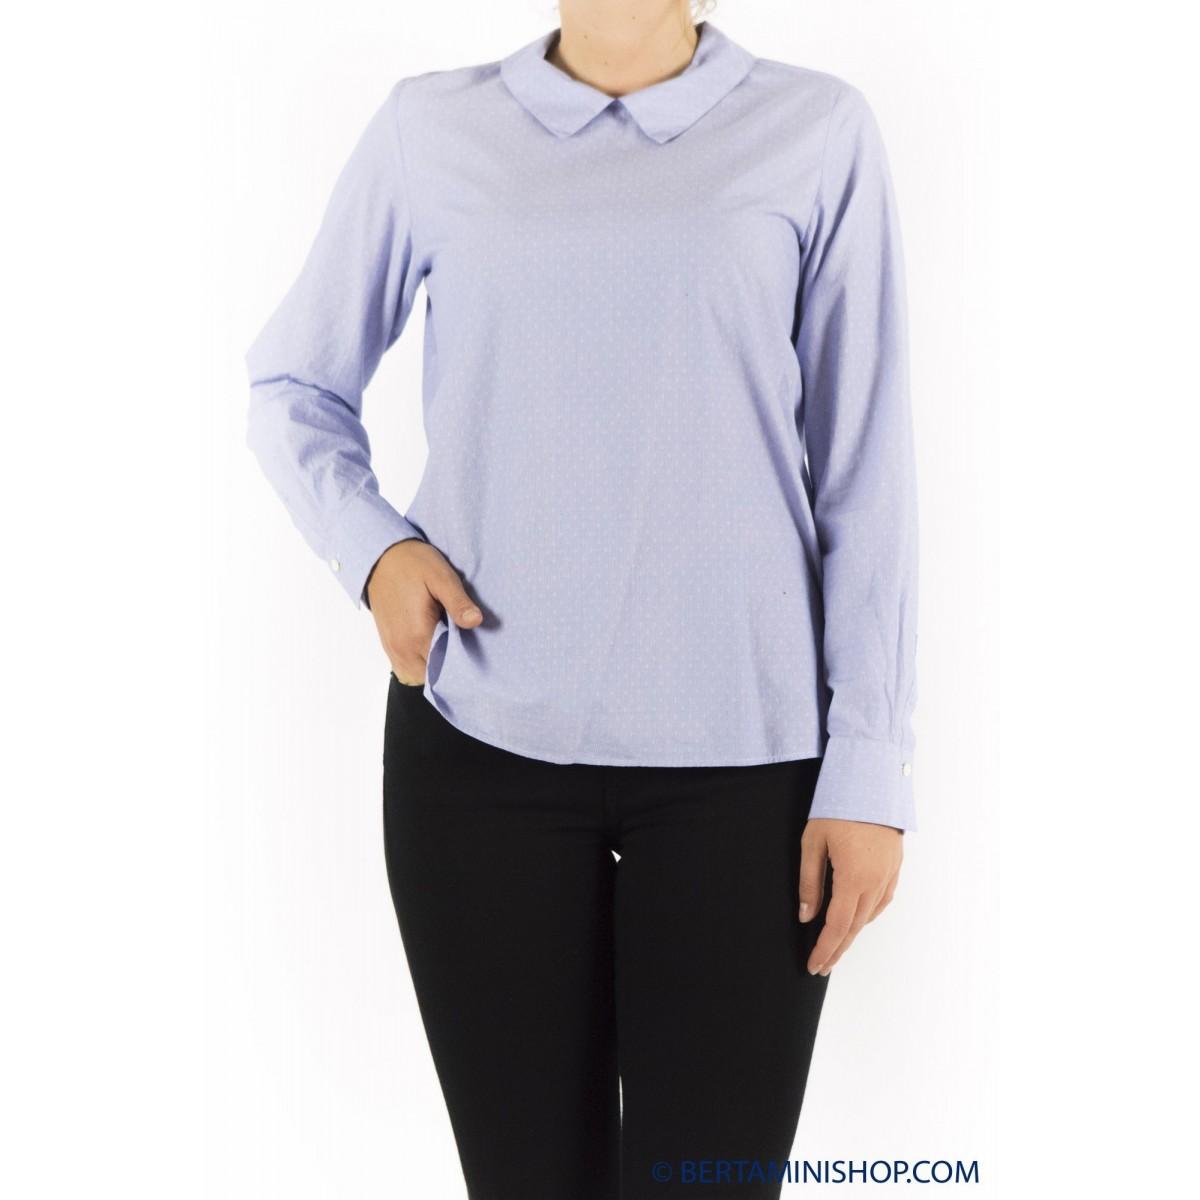 Bluse Glanshirt Red Damen - Blanch L6523 802- Azzurra puntino